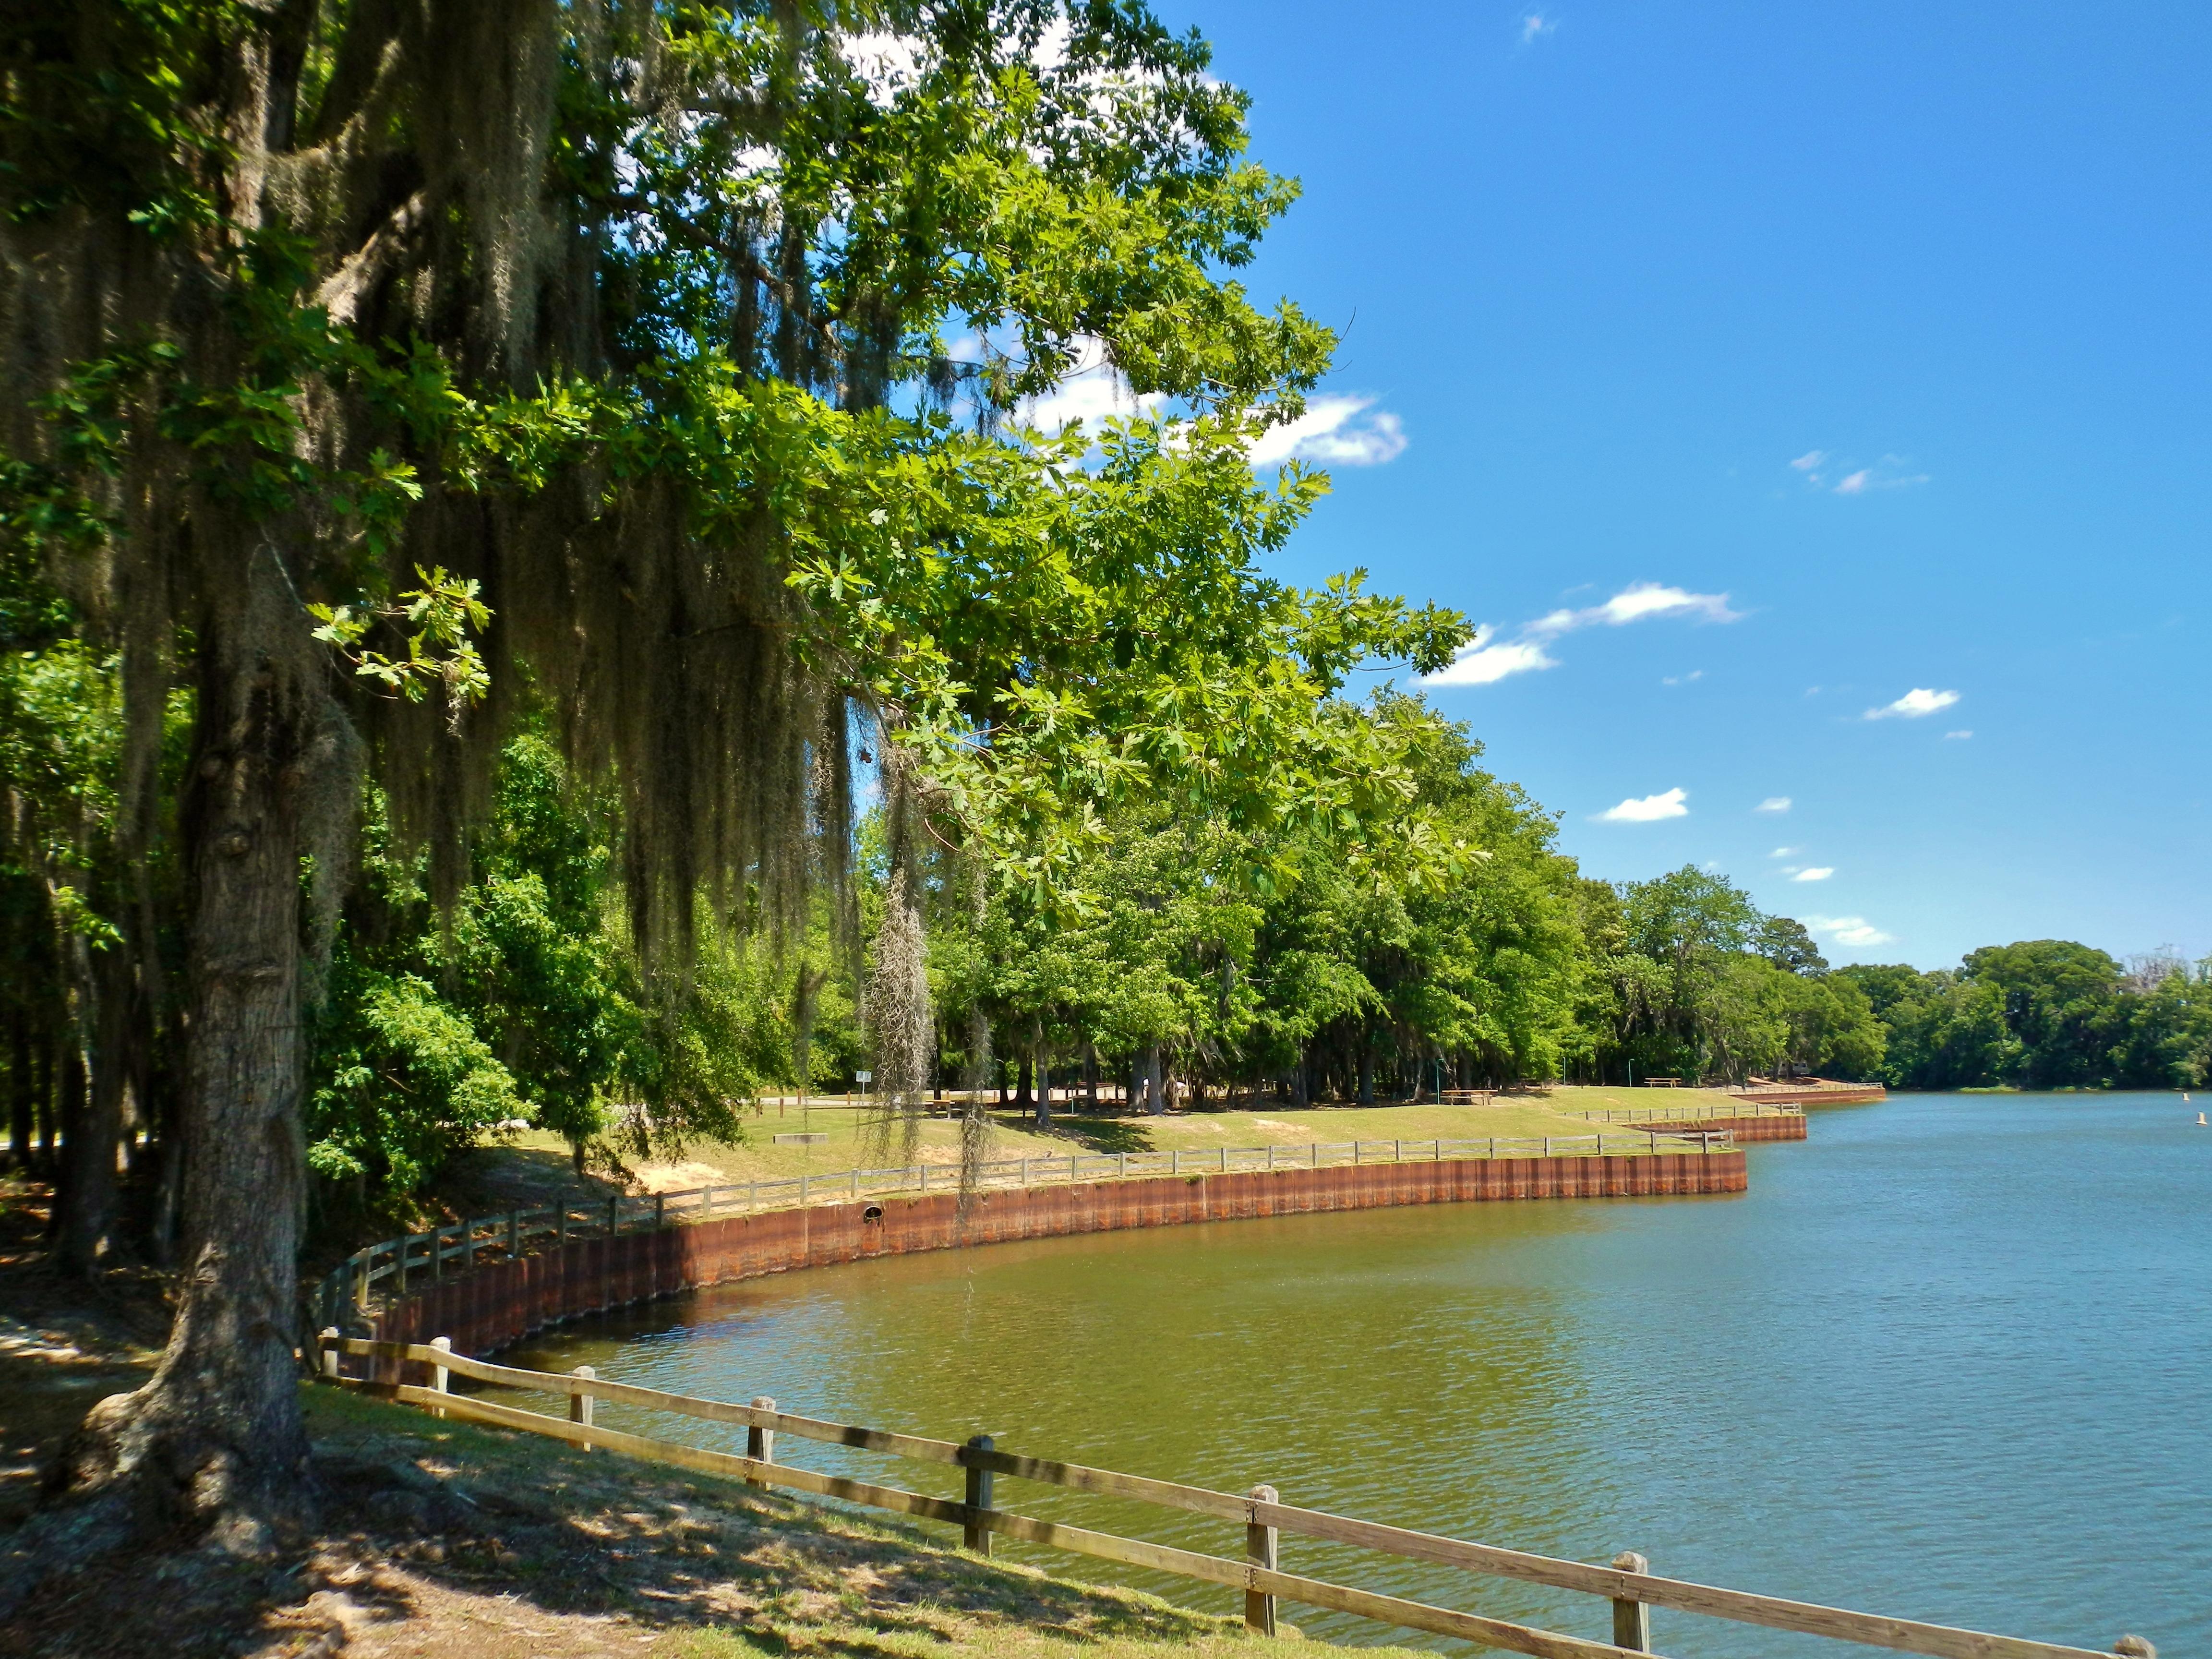 Middle Island Park